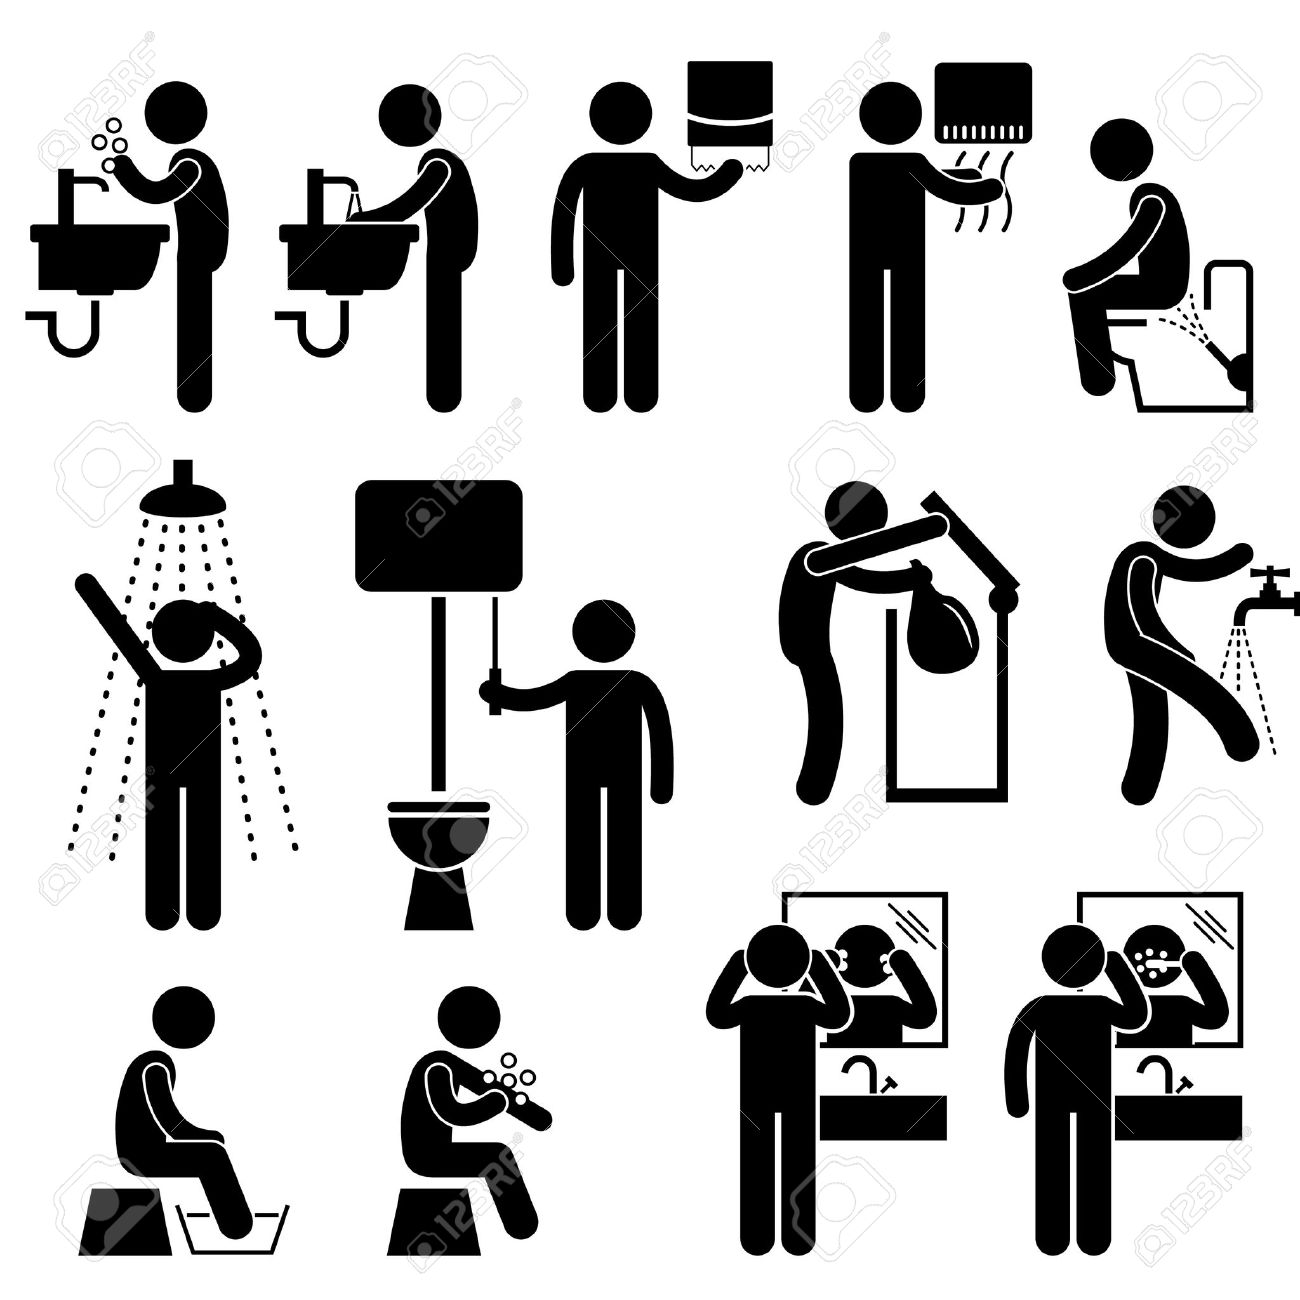 Personal Hygiene Washing Hand Face Shower Bath Brushing Teeth Toilet Bathroom Stick Figure Pictogram Icon Stock Vector - 18809498